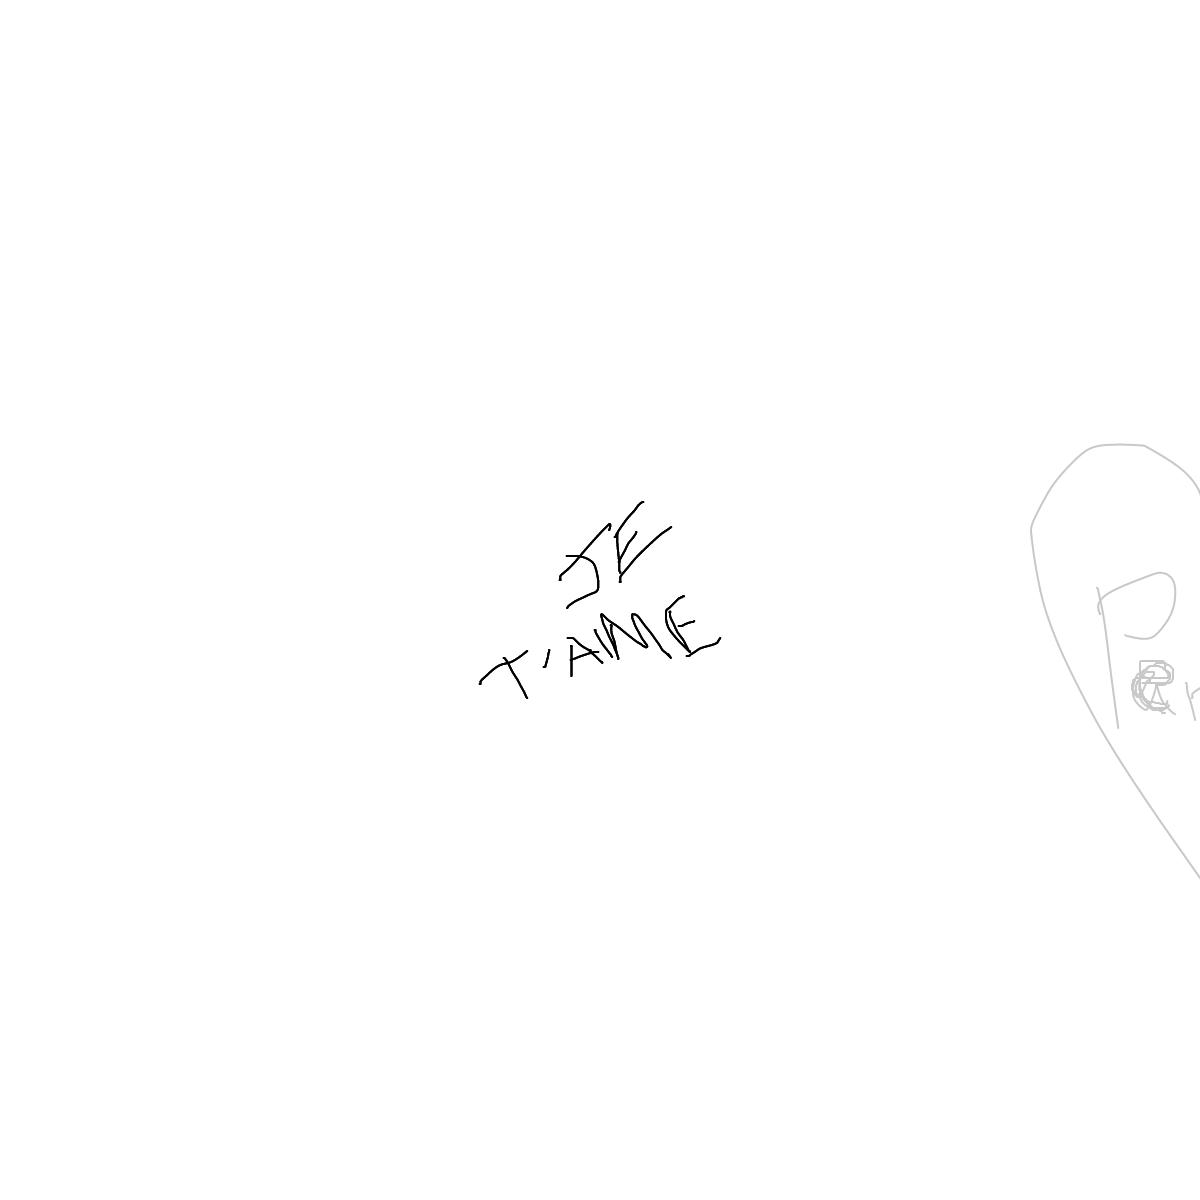 BAAAM drawing#7904 lat:48.8718757629394500lng: 2.3175959587097170